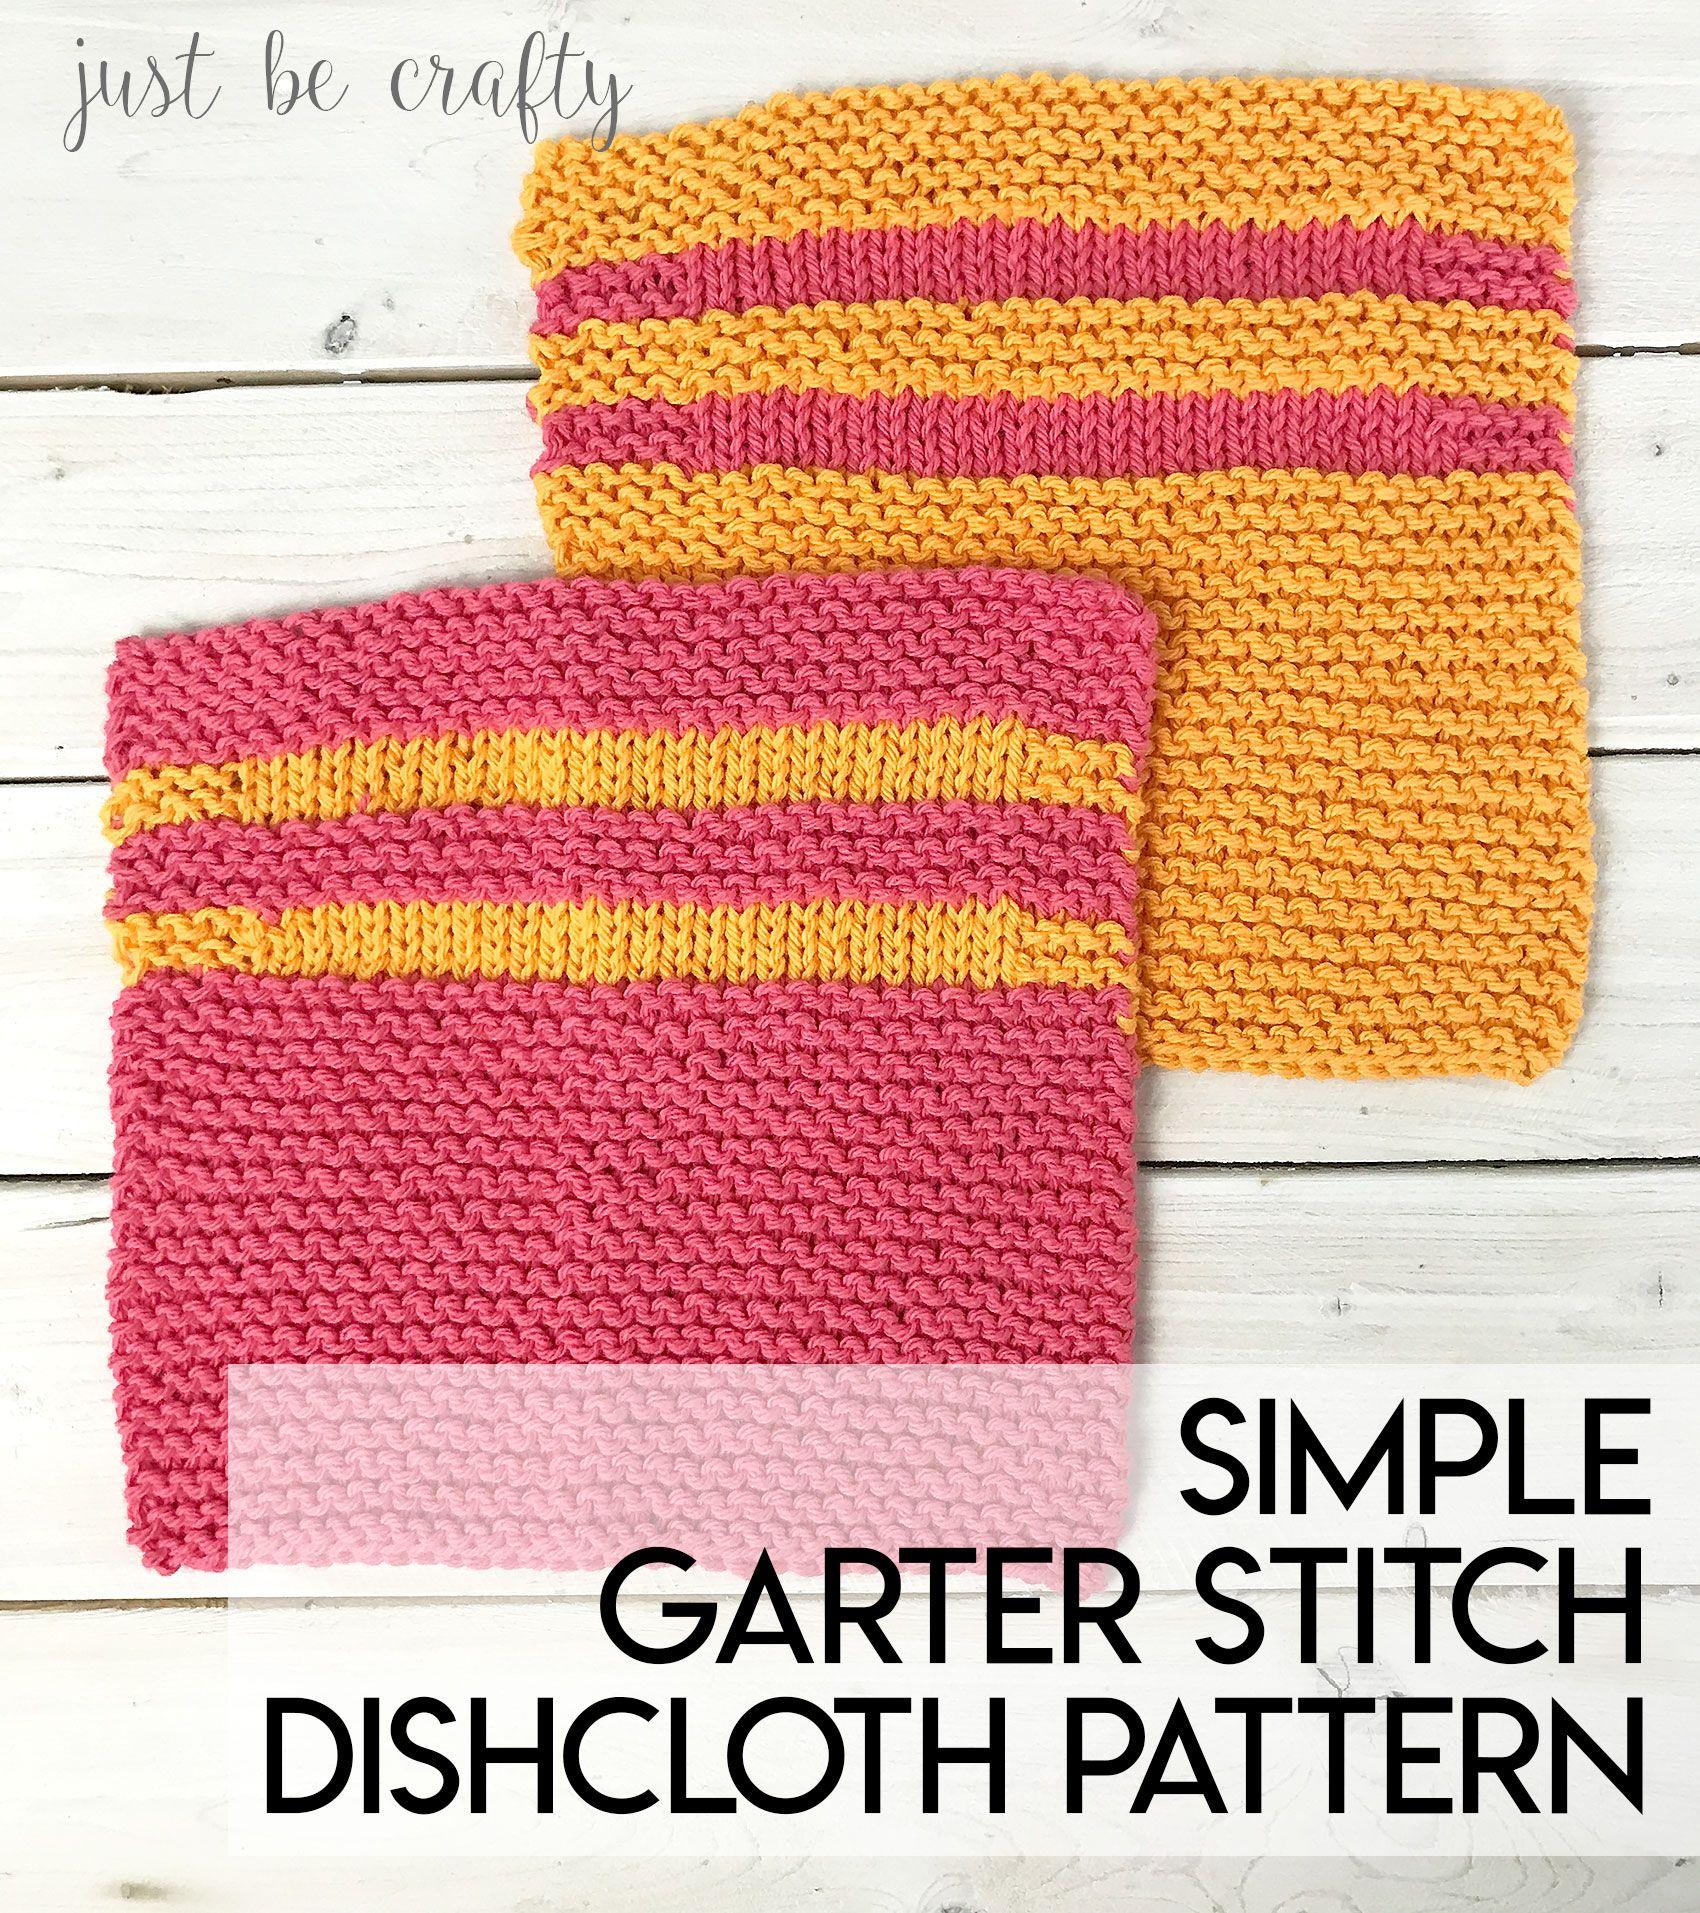 Simple Garter Stitch Dishcloth Pattern - Free Pattern by | Free ...